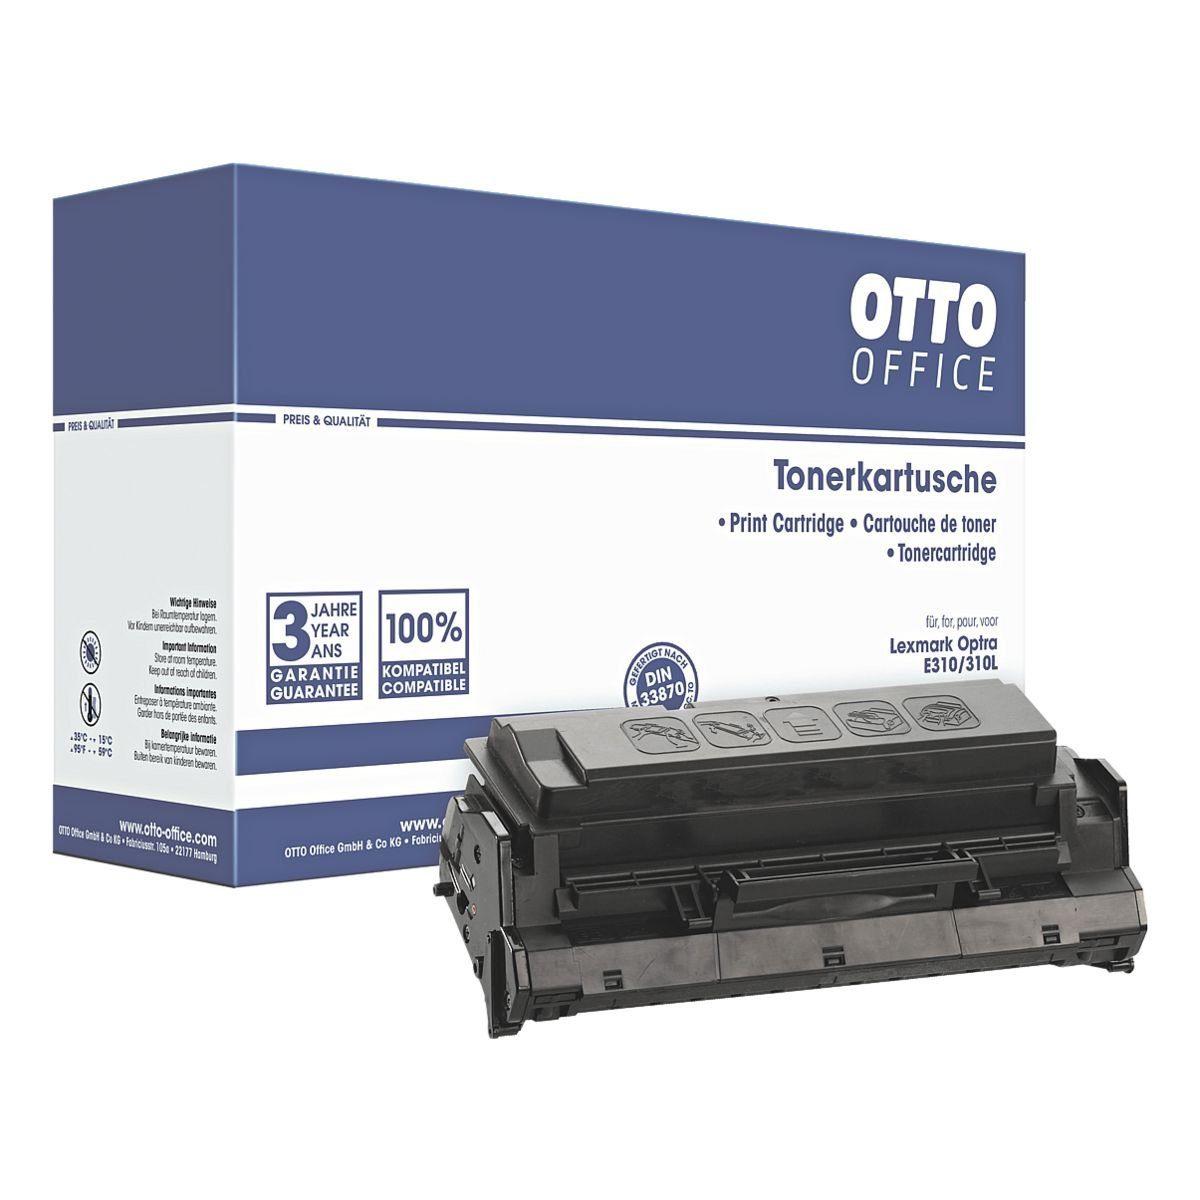 OTTO Office Toner ersetzt Lexmark »13T0101«